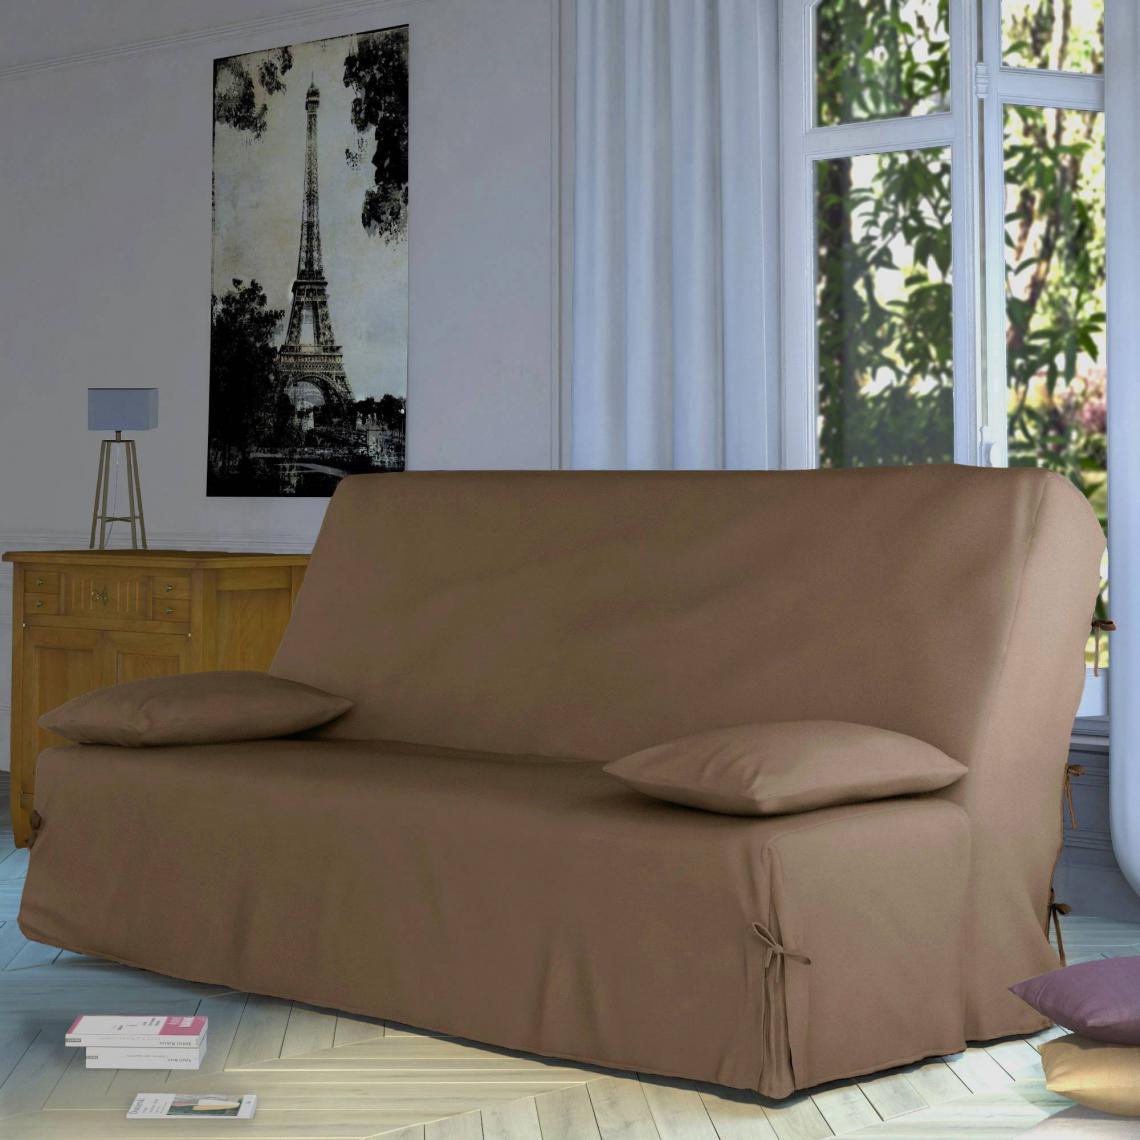 housse clic clac int grale non matelass e tertio. Black Bedroom Furniture Sets. Home Design Ideas